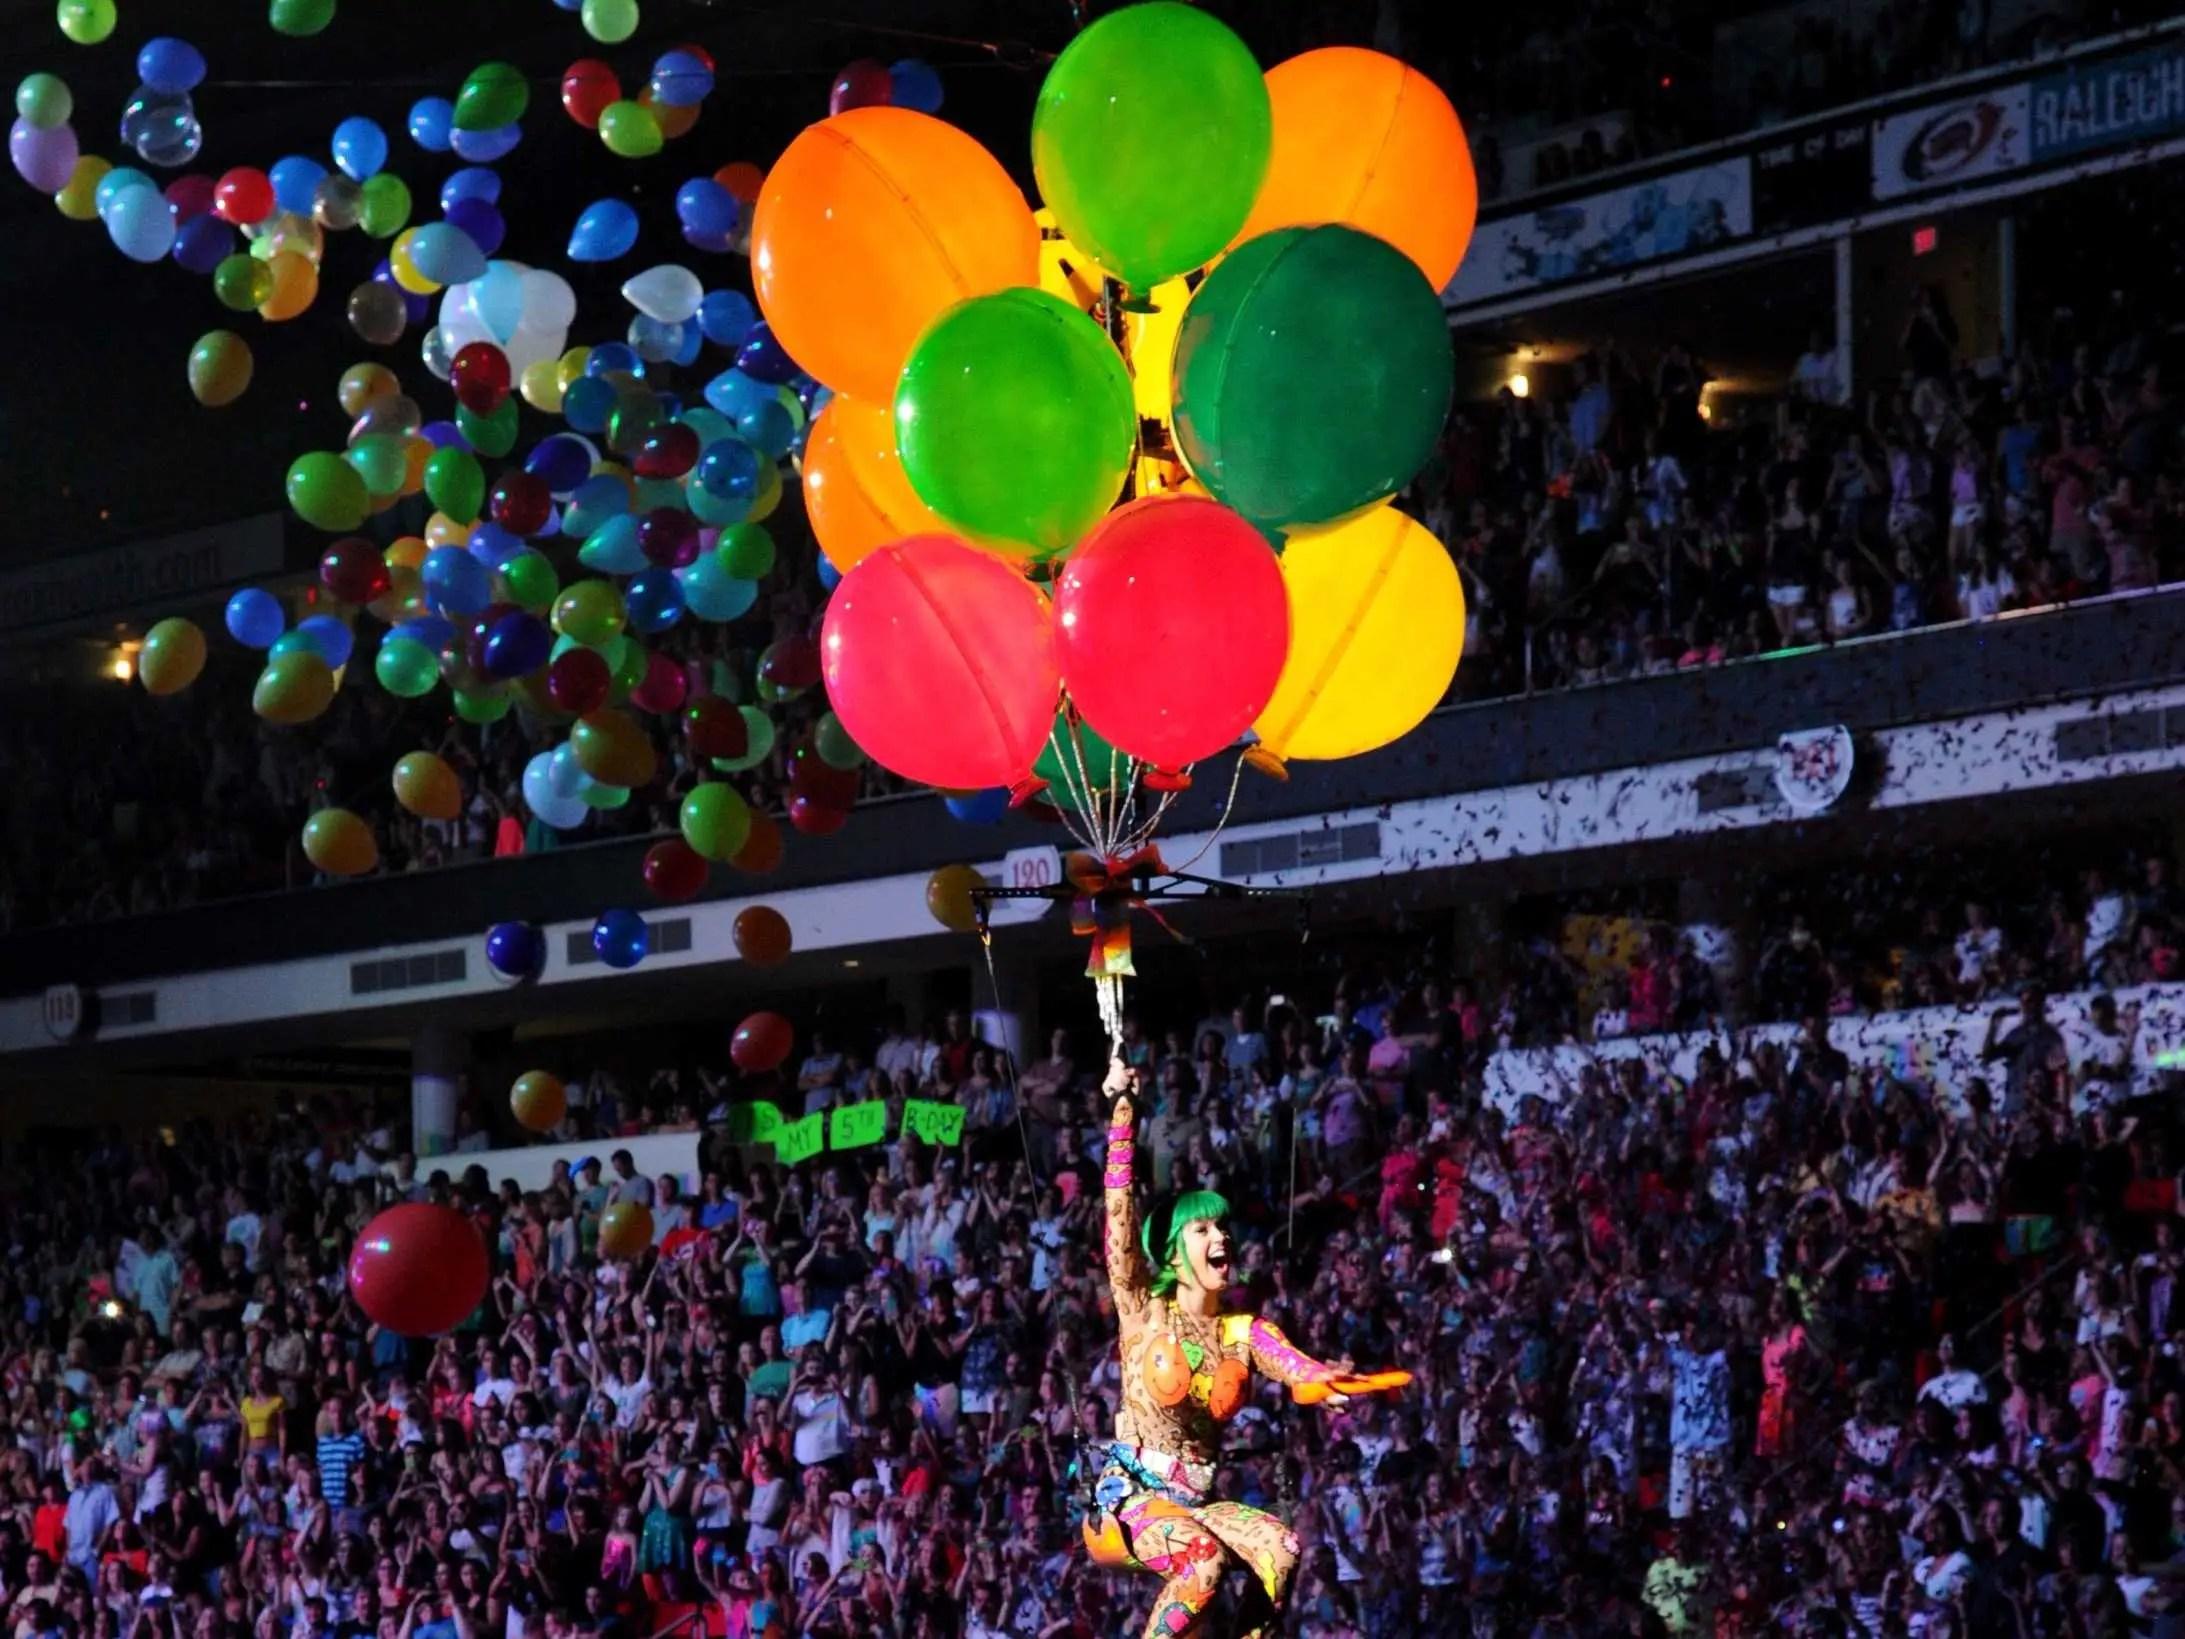 katy perry balloons